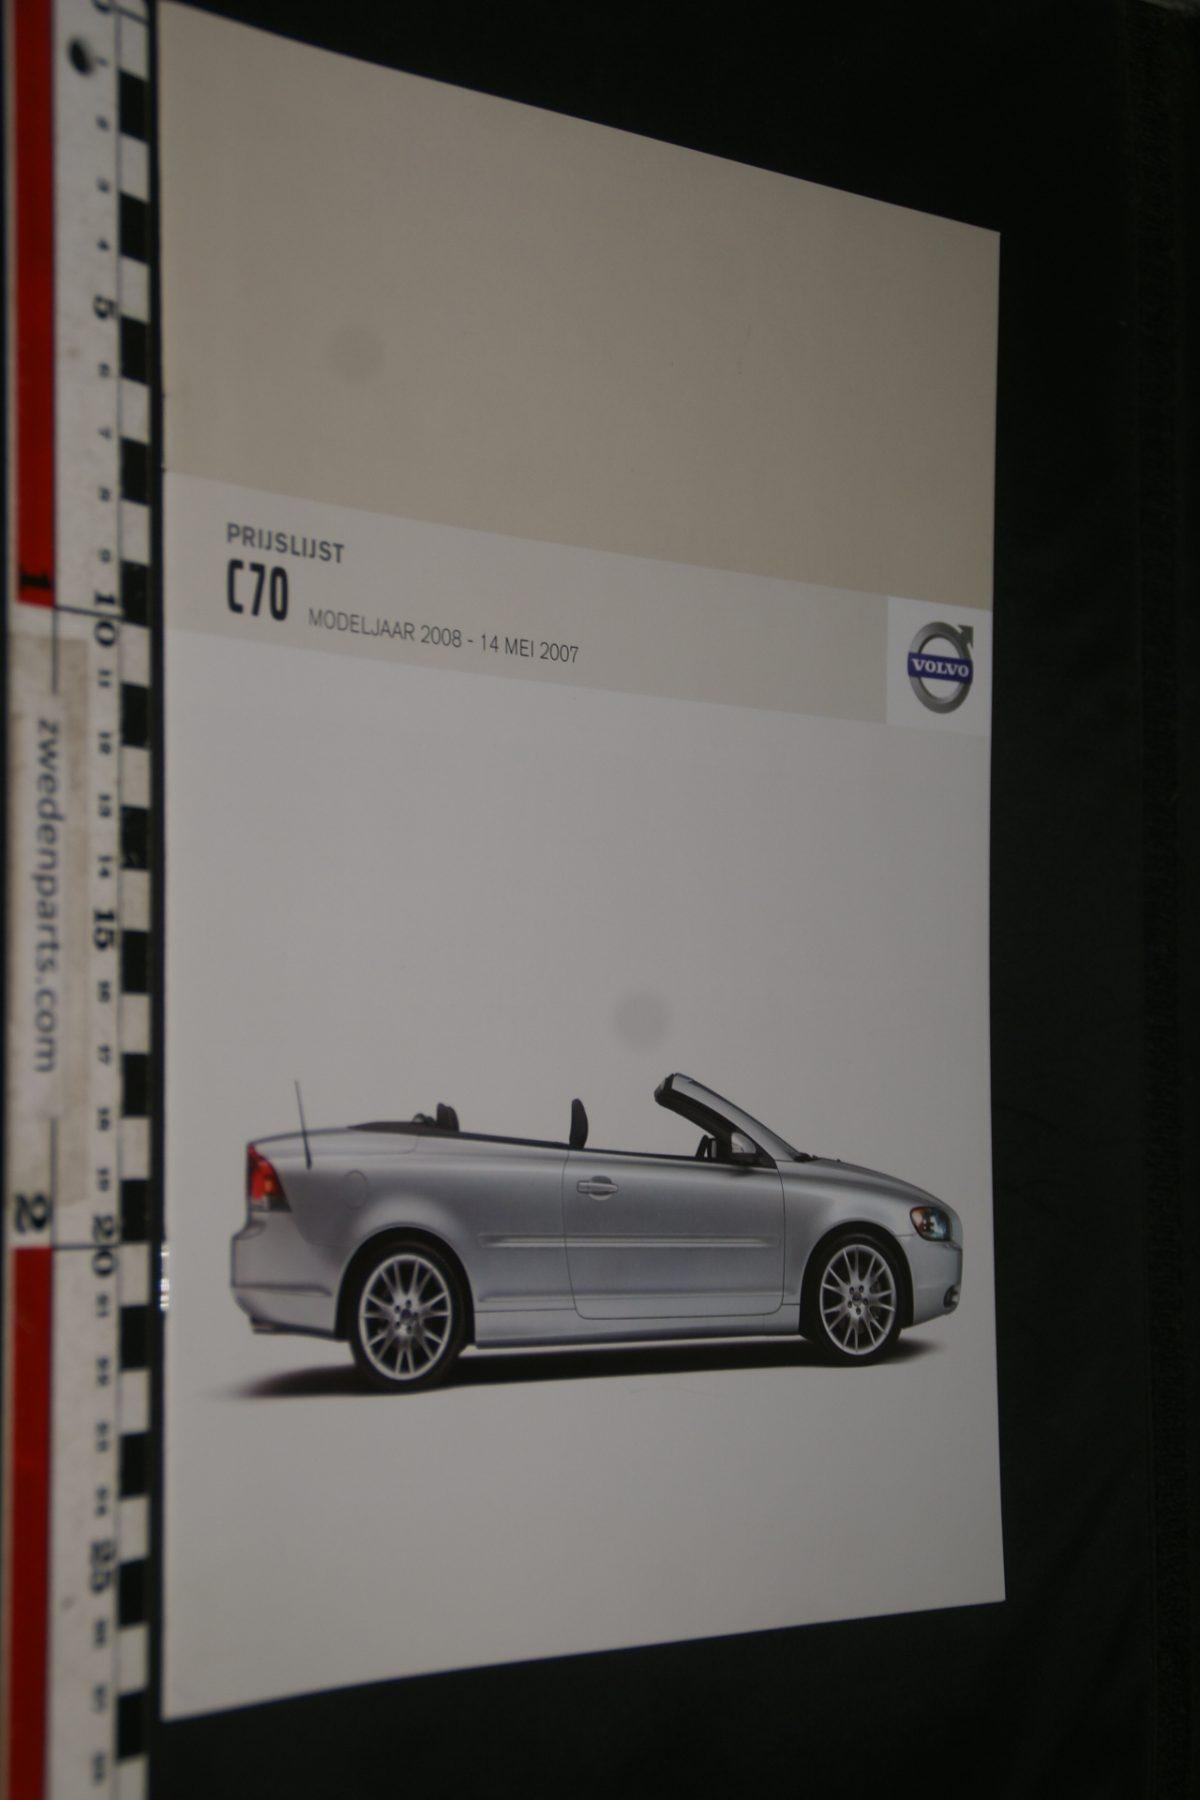 DSC06068 2008 brochure prijslijst Volvo C70 nr C70MY08 03-07-V1